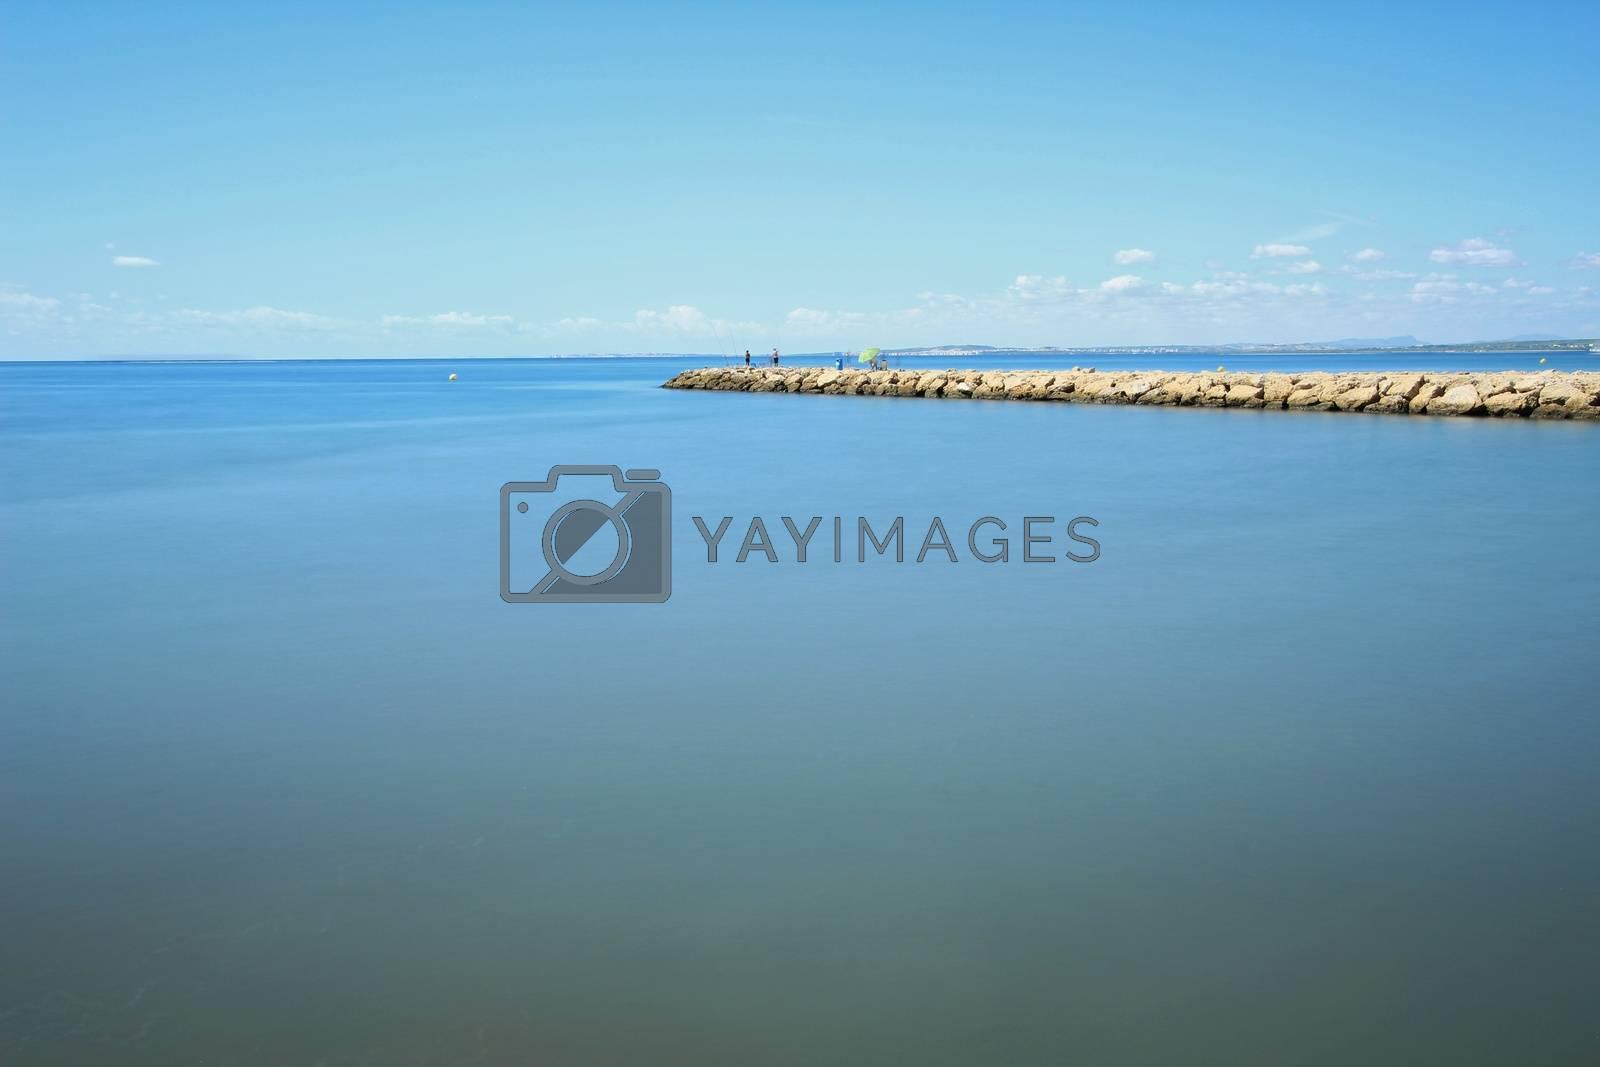 Fishing day on a breakwater under the sun in Santa Pola, Spain